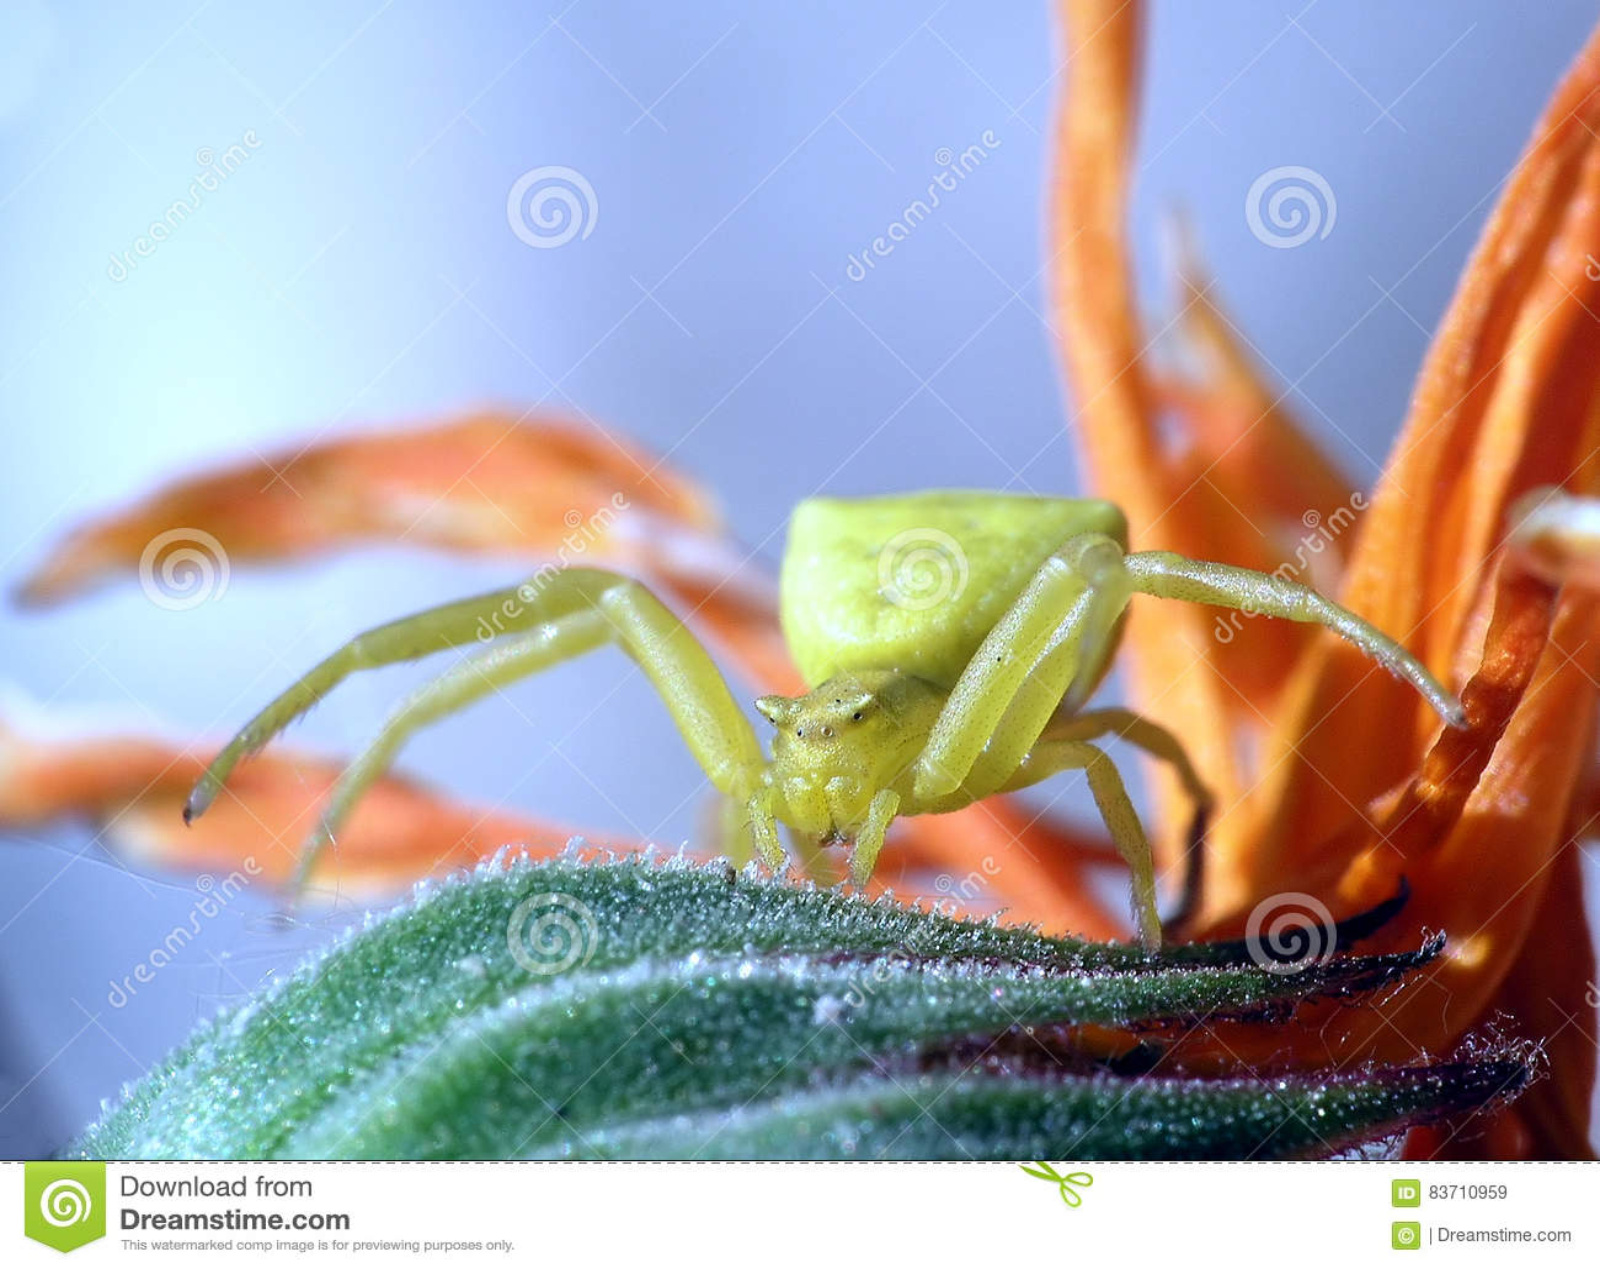 Green Yellow Spider Stock Photo